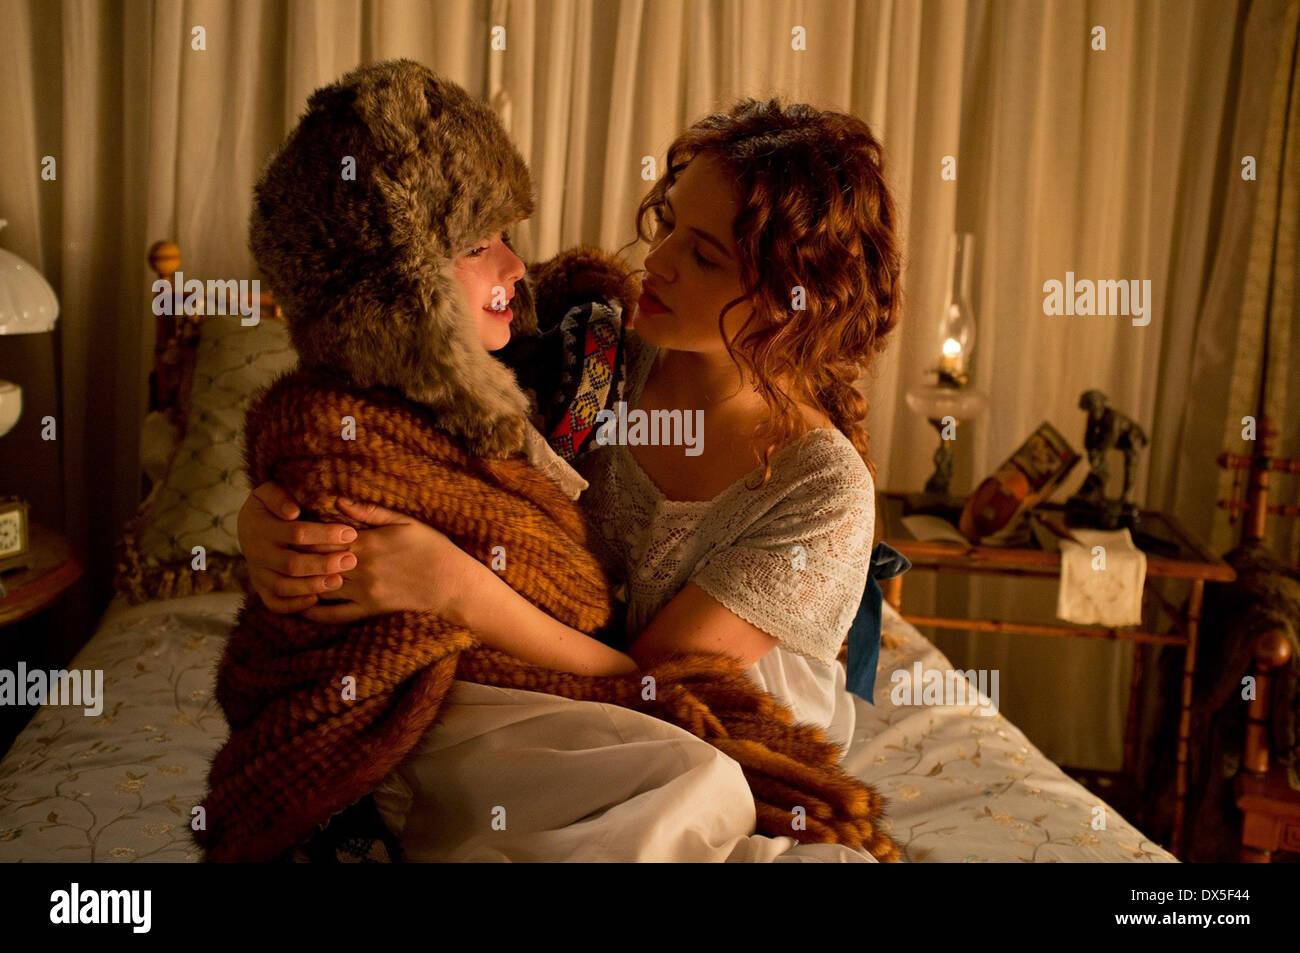 A WINTER'S TALE (2014) MCKAYLA TWIGGS JESSICA BROWN FINDLAY AKIVA GOLDSMAN (DIR) MOVIESTORE COLLECTION LTD - Stock Image